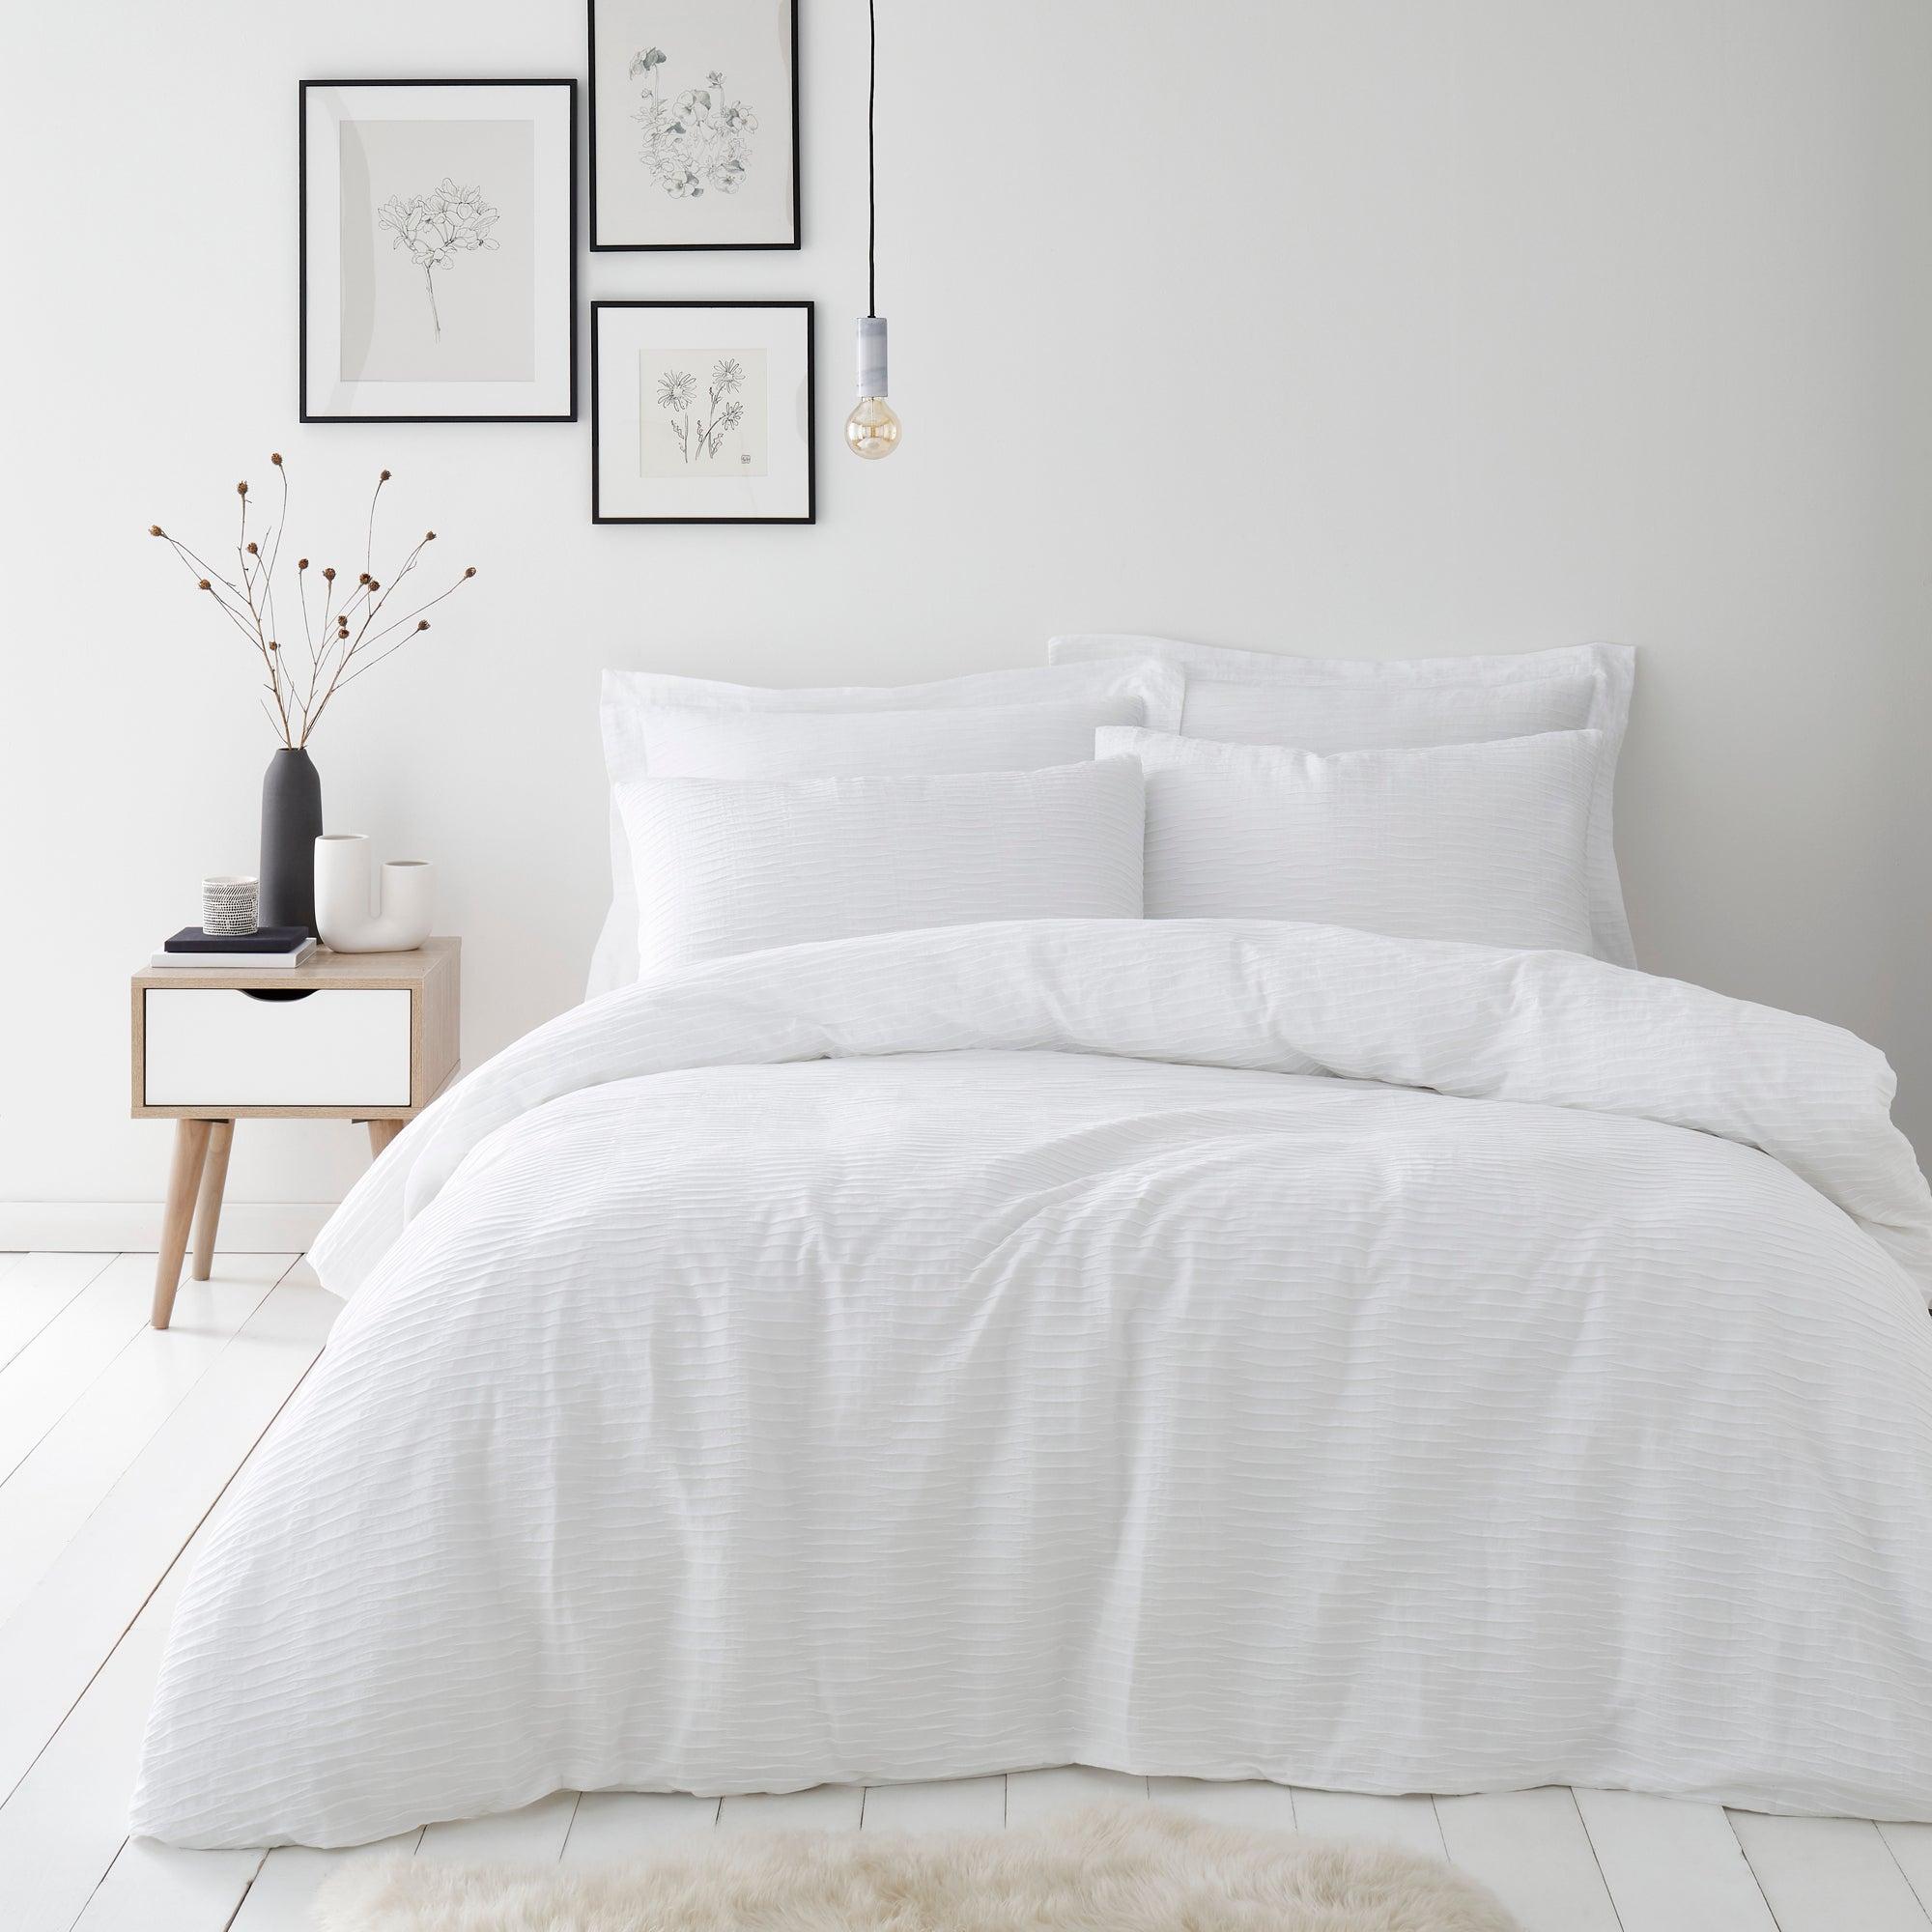 Image of Alissa White Duvet Cover and Pillowcase Set White